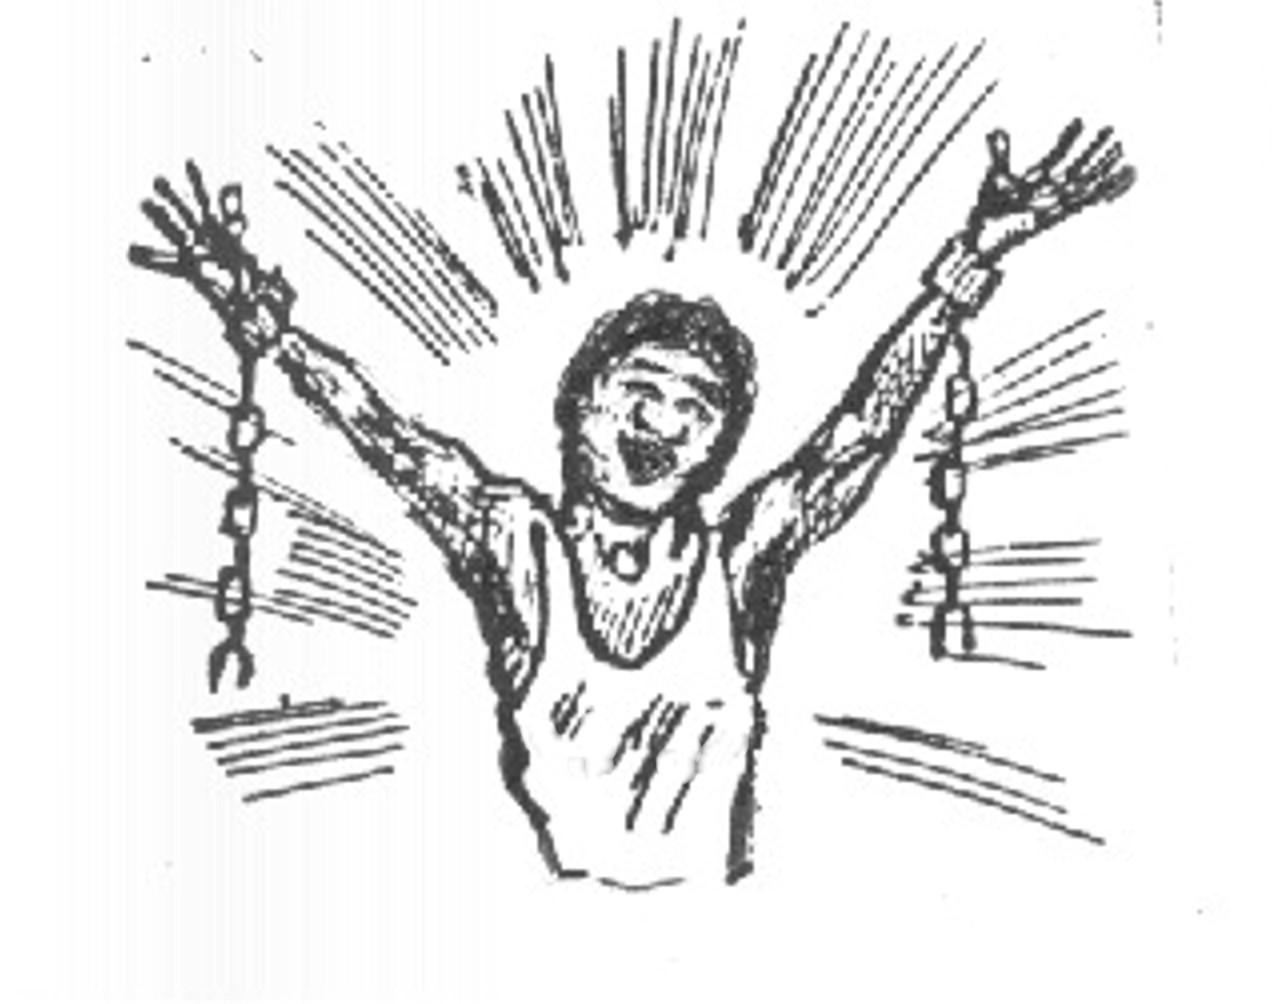 Abolish slavery clipart svg royalty free Free Slavery Cliparts, Download Free Clip Art, Free Clip Art on ... svg royalty free